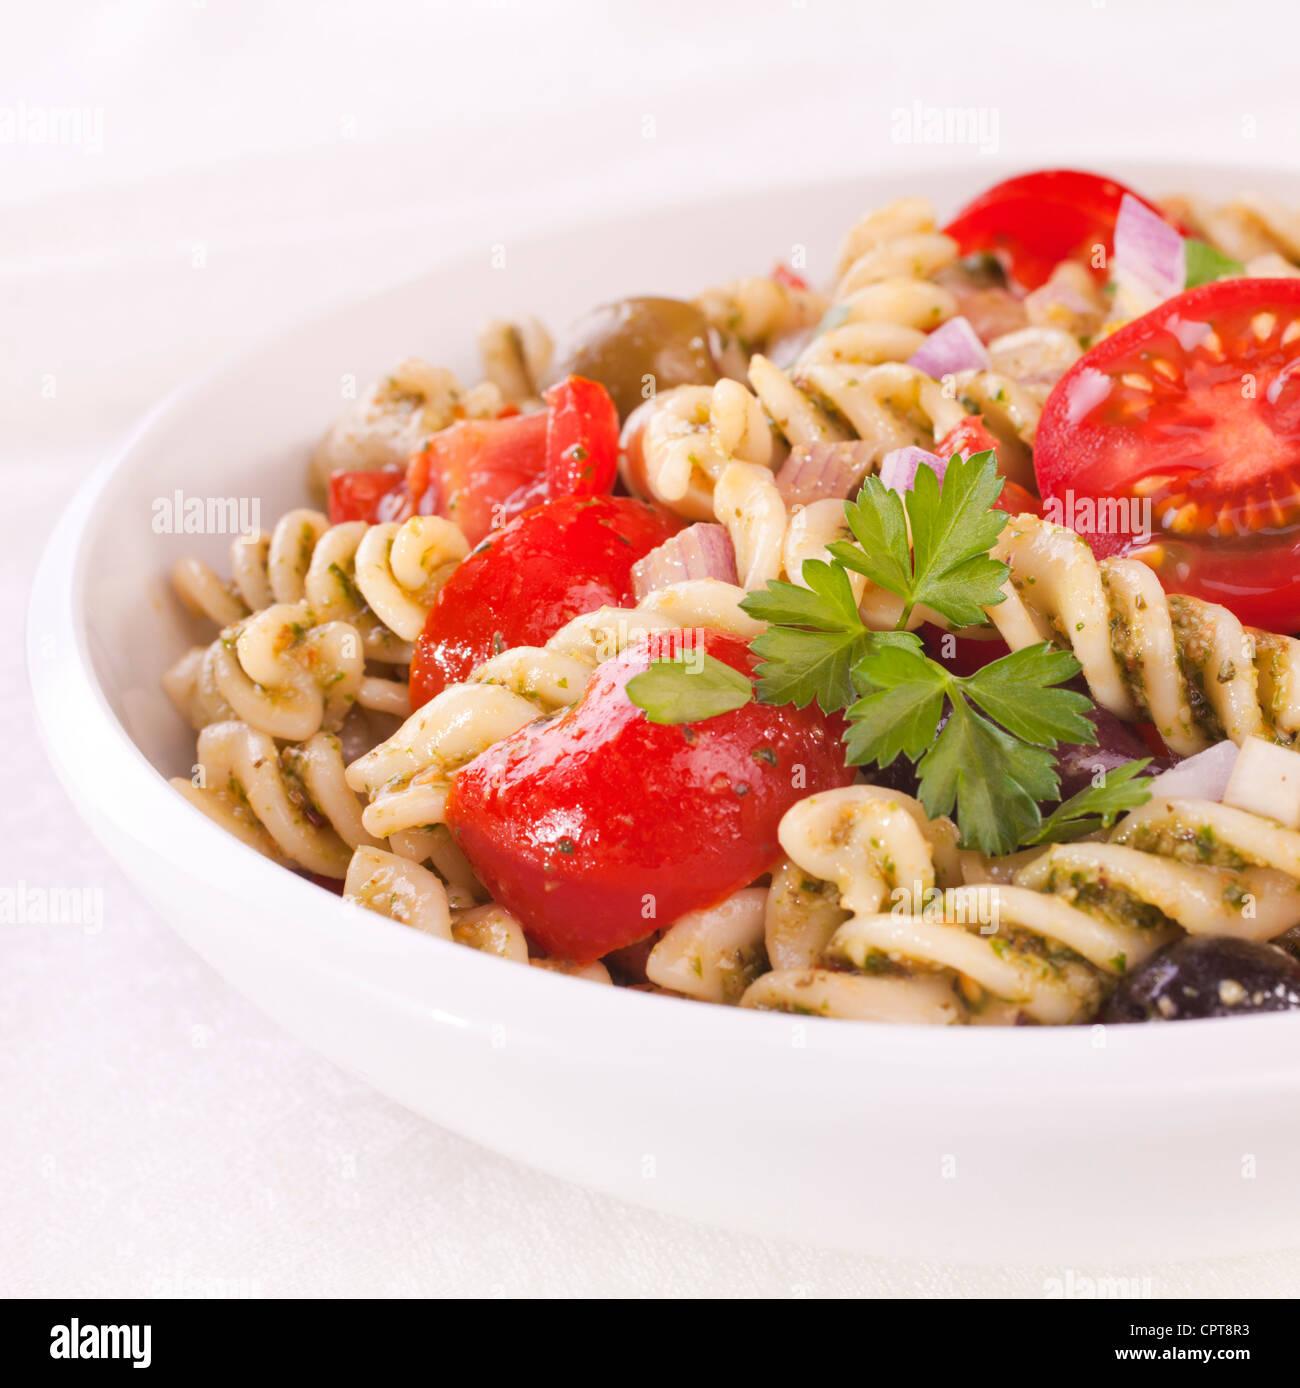 Fusili pasta salad, with rocket pesto, juicy tomatoes, olives and onion. - Stock Image